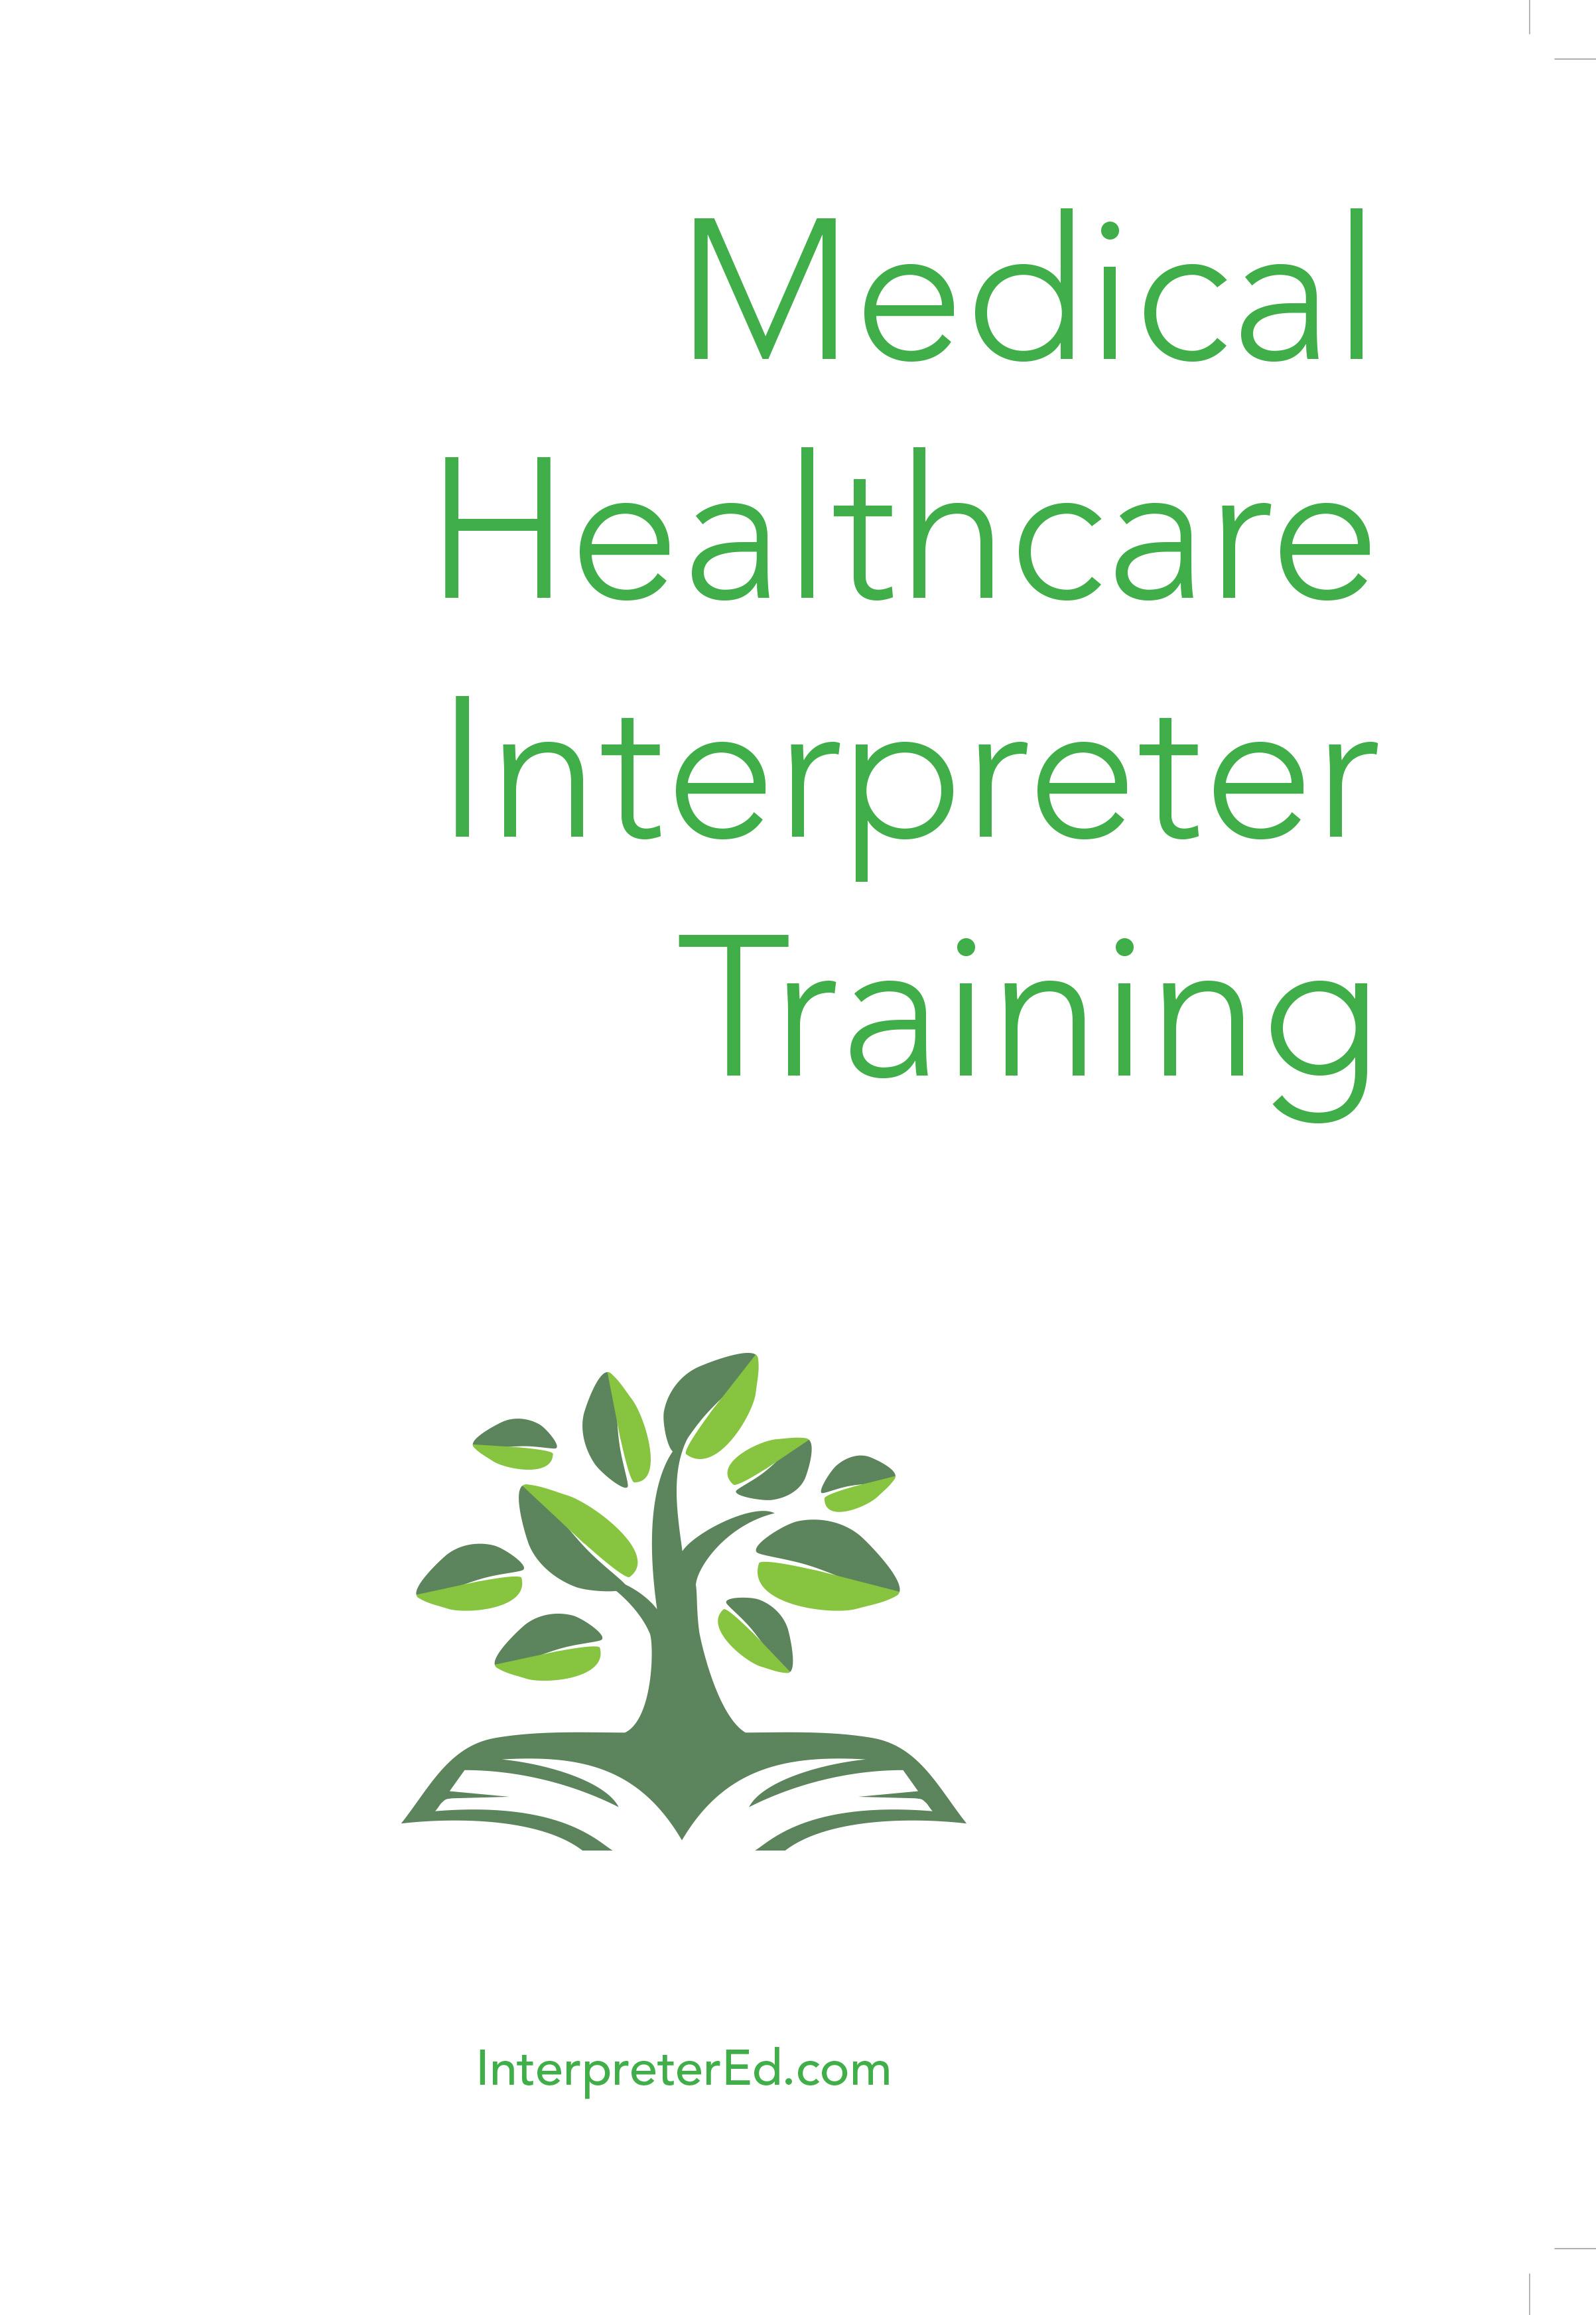 InterpreterEd.com